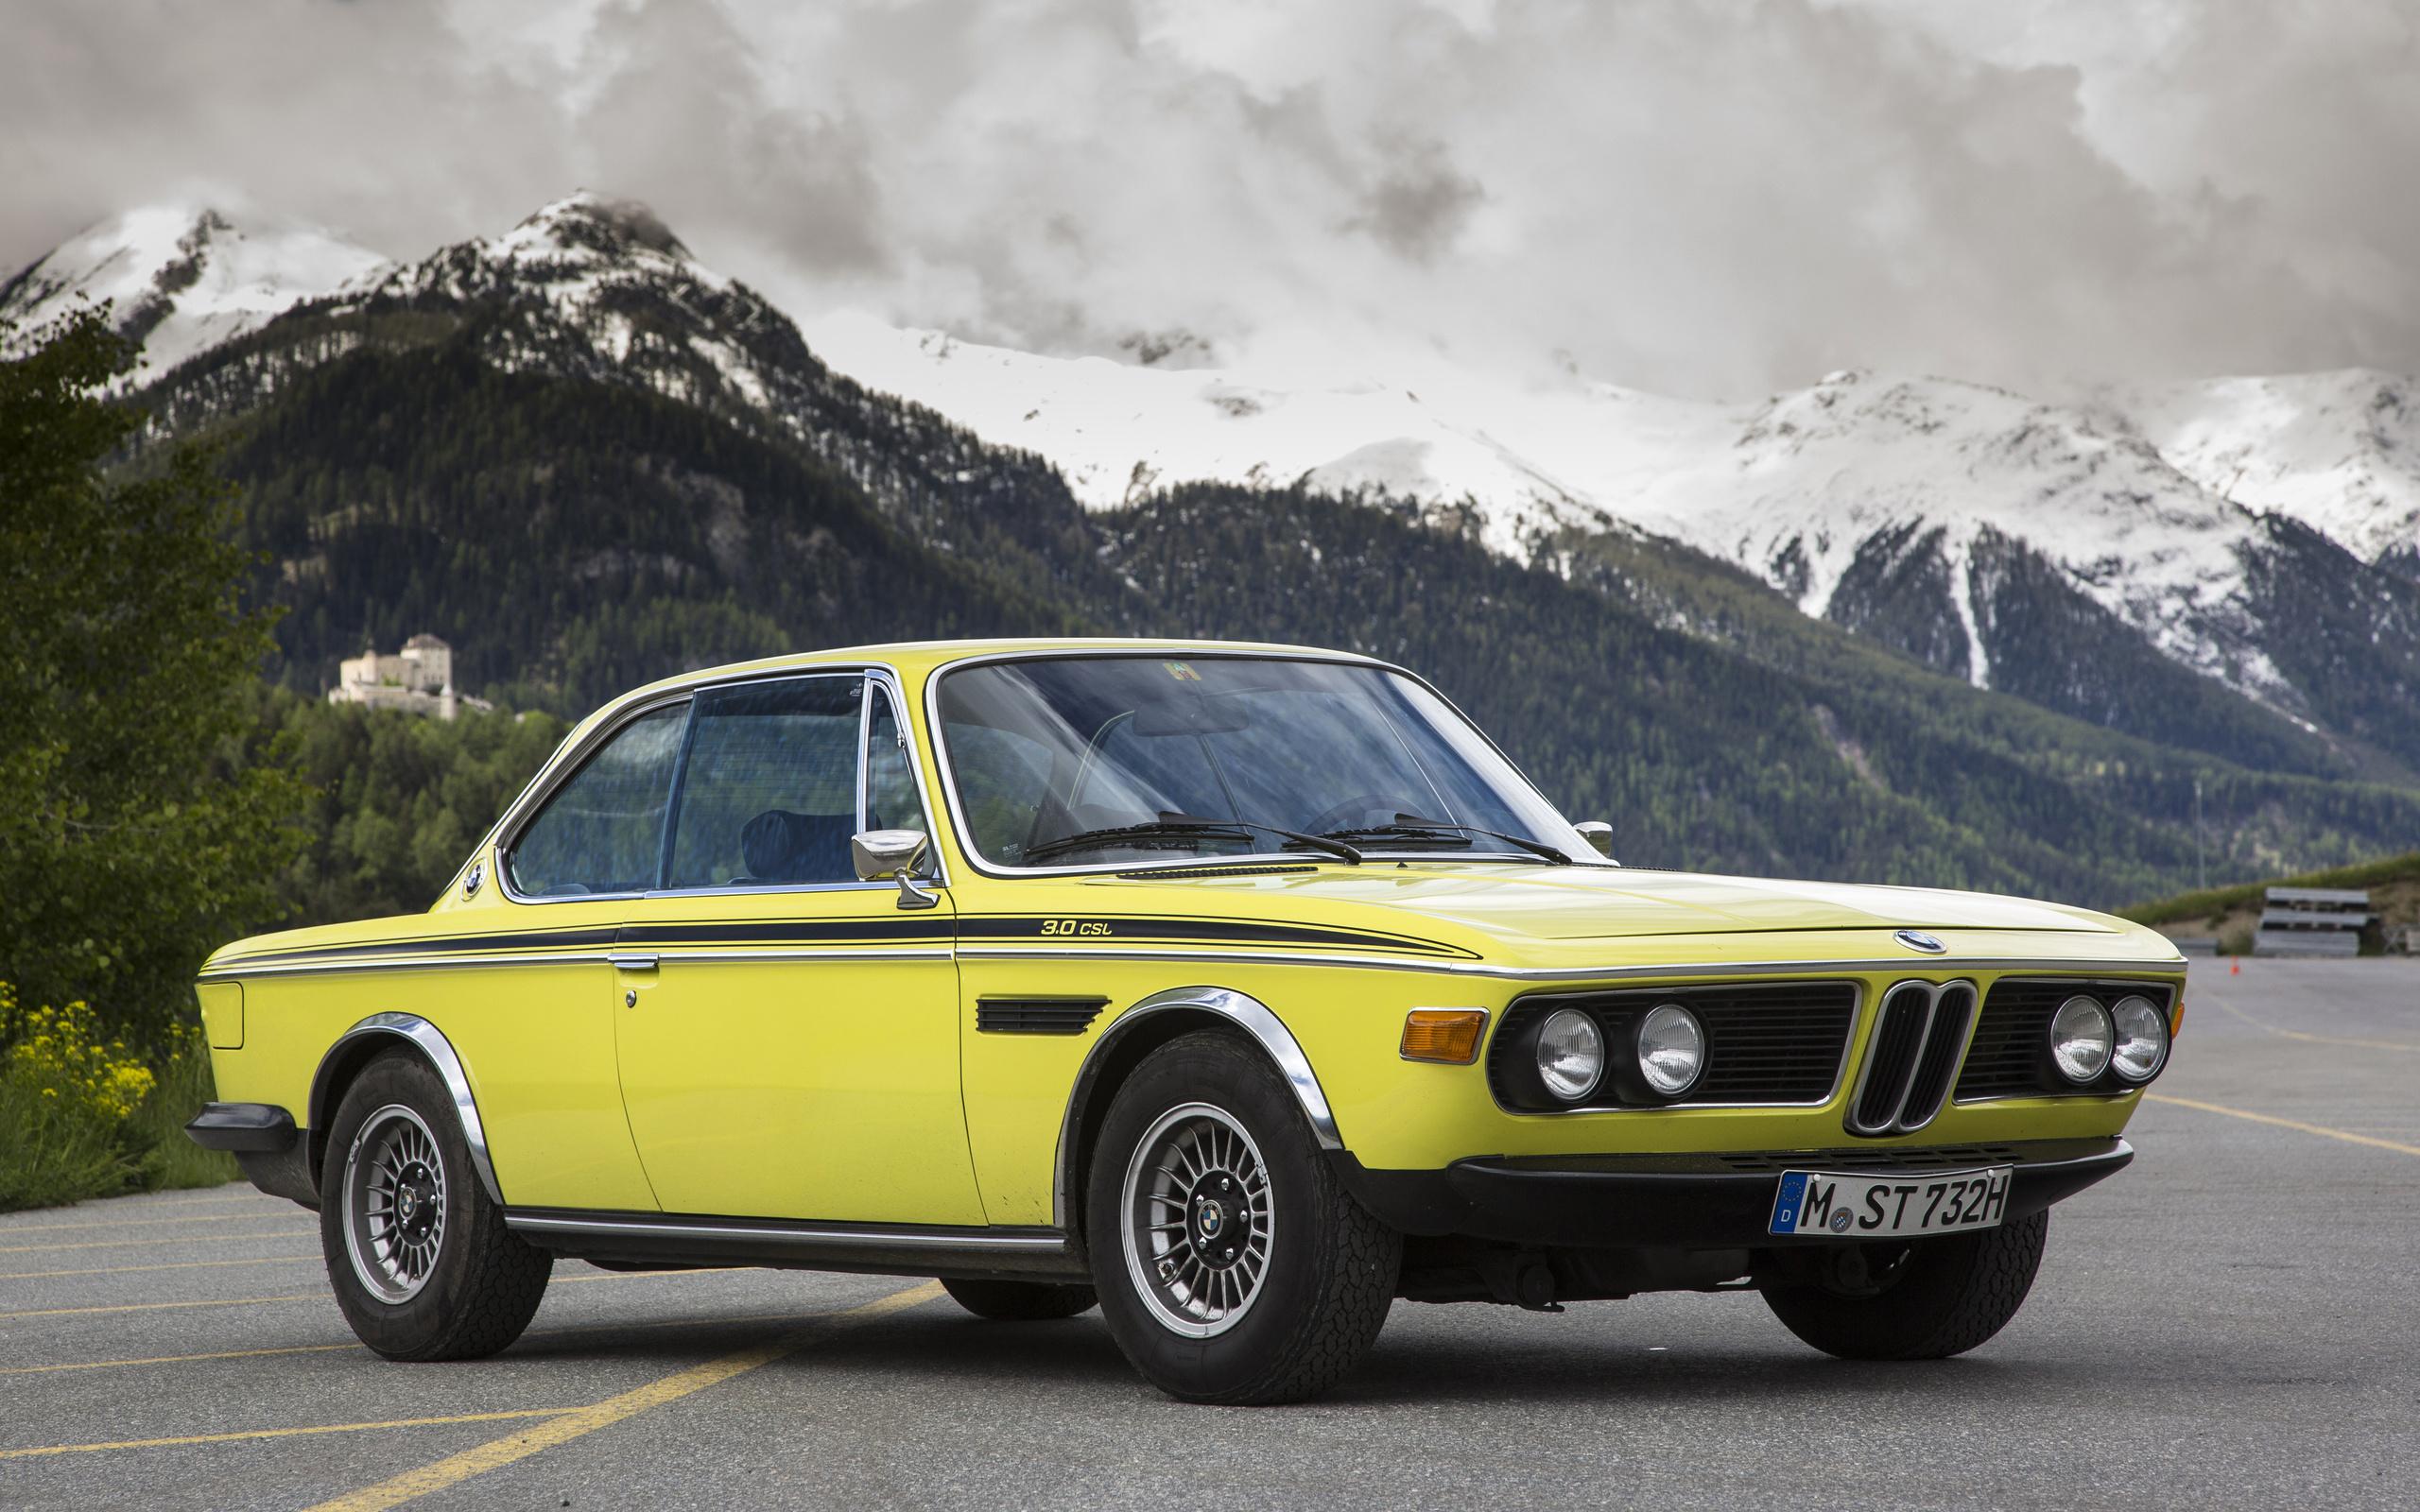 bmw, ретро, горы, желтый, 1971-73, 3.0, csl, worldwide, бмв, e9